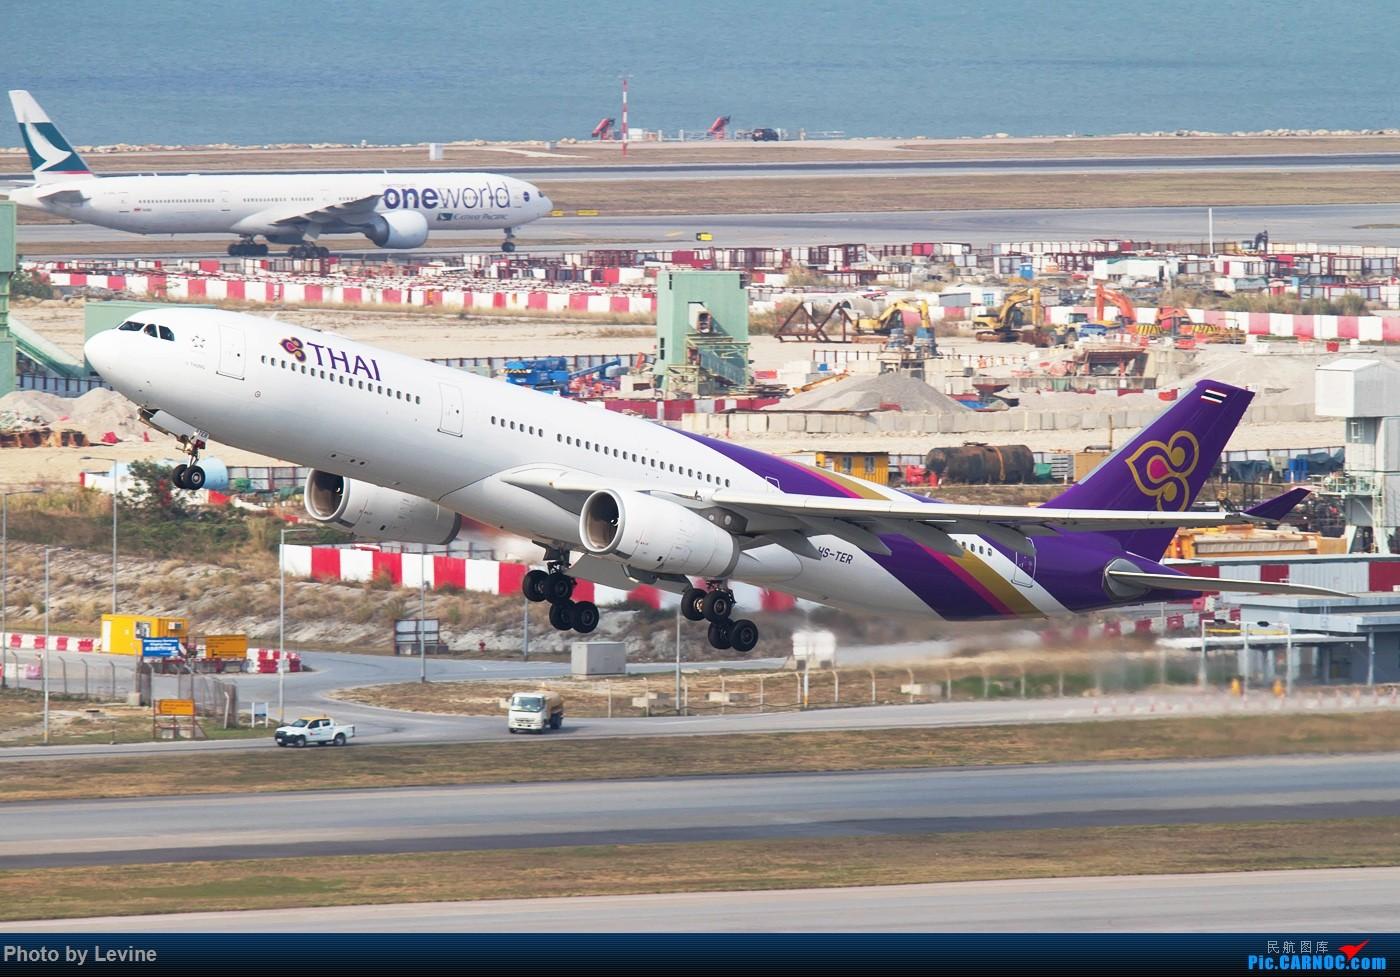 Re:[原创]今冬沙螺湾 迟来的图片 AIRBUS A330-300 HS-TER 中国香港国际机场